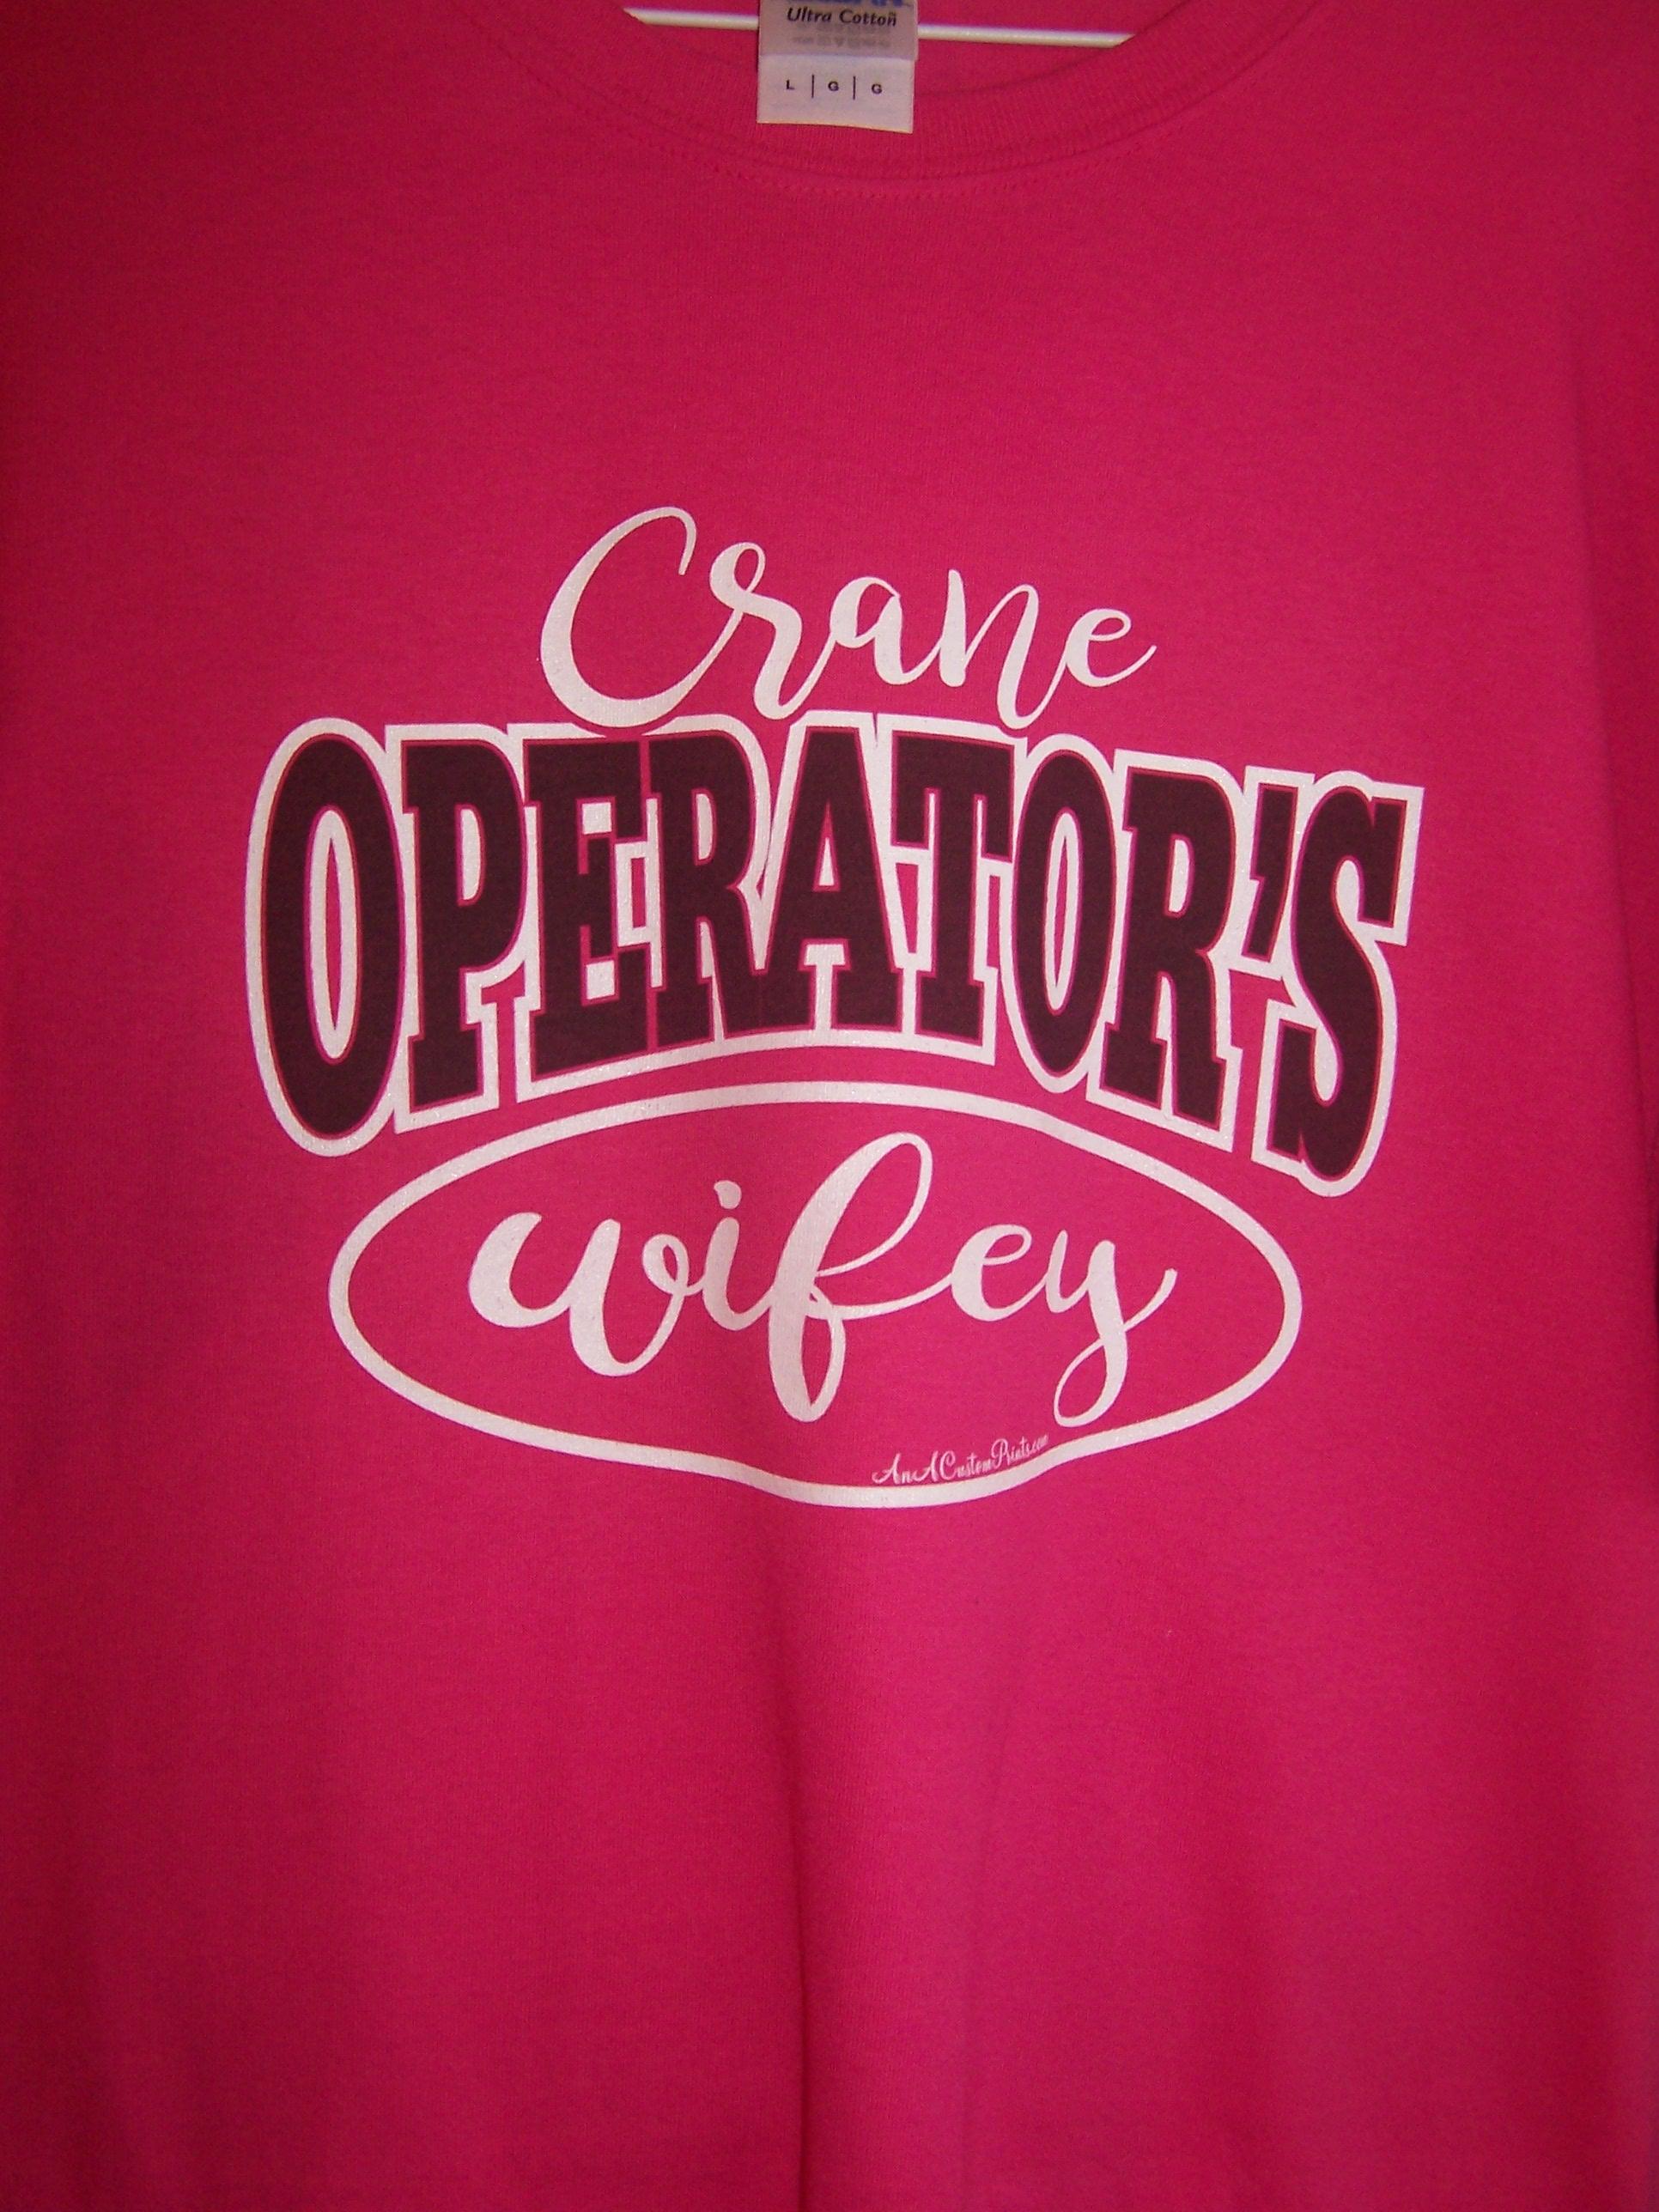 Crane Operator's Wifey